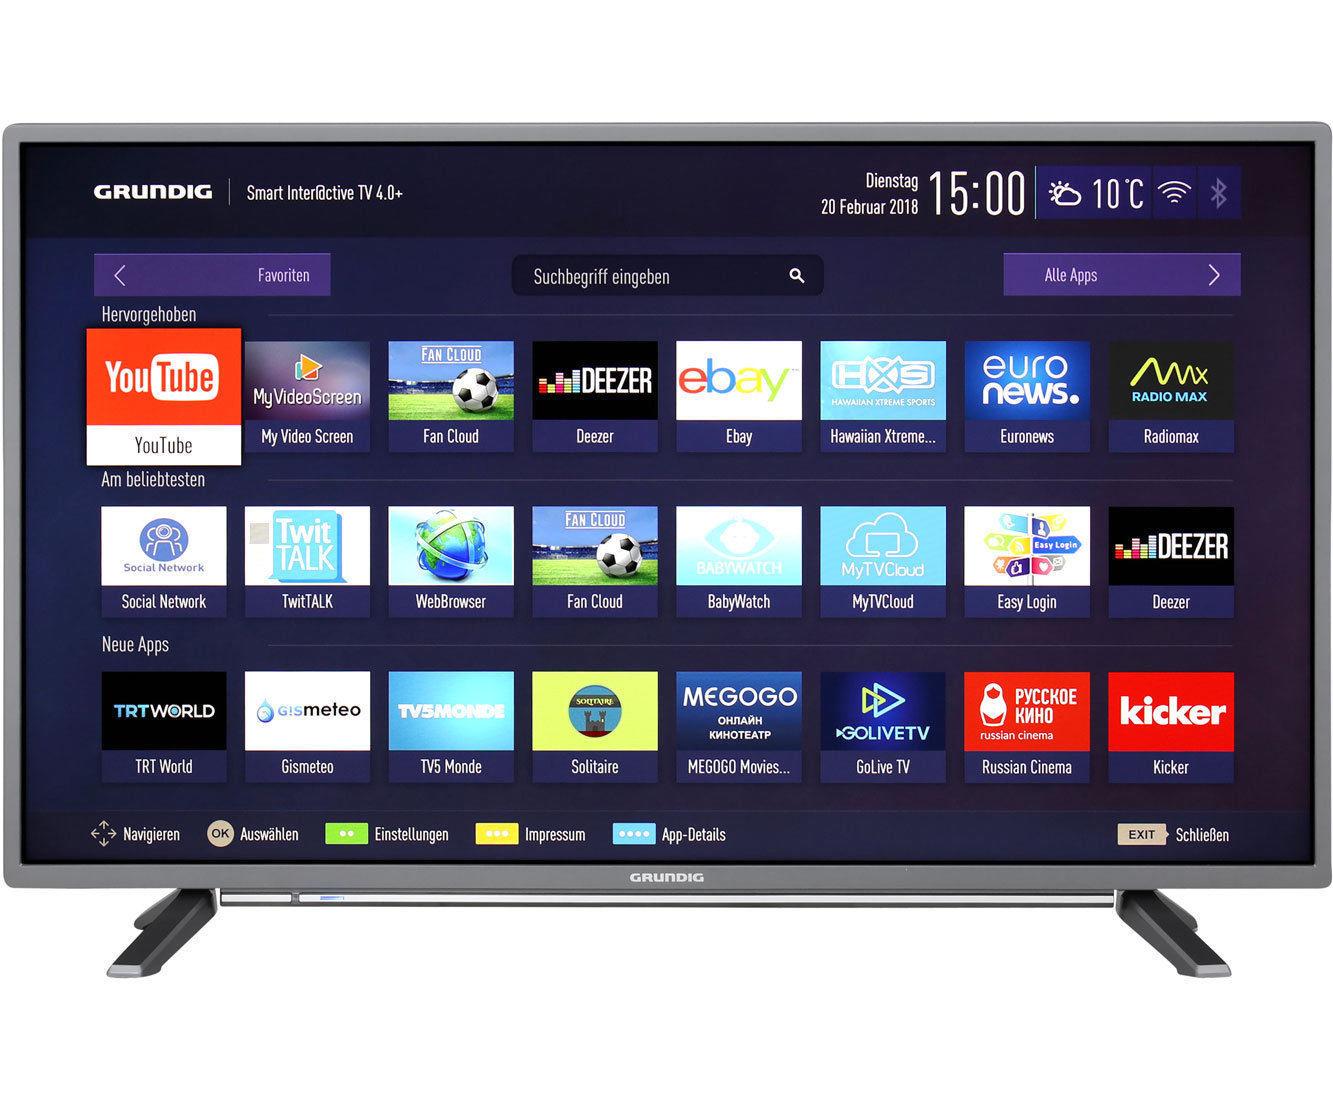 Grundig GFT 6728 32 Zoll Smart TV